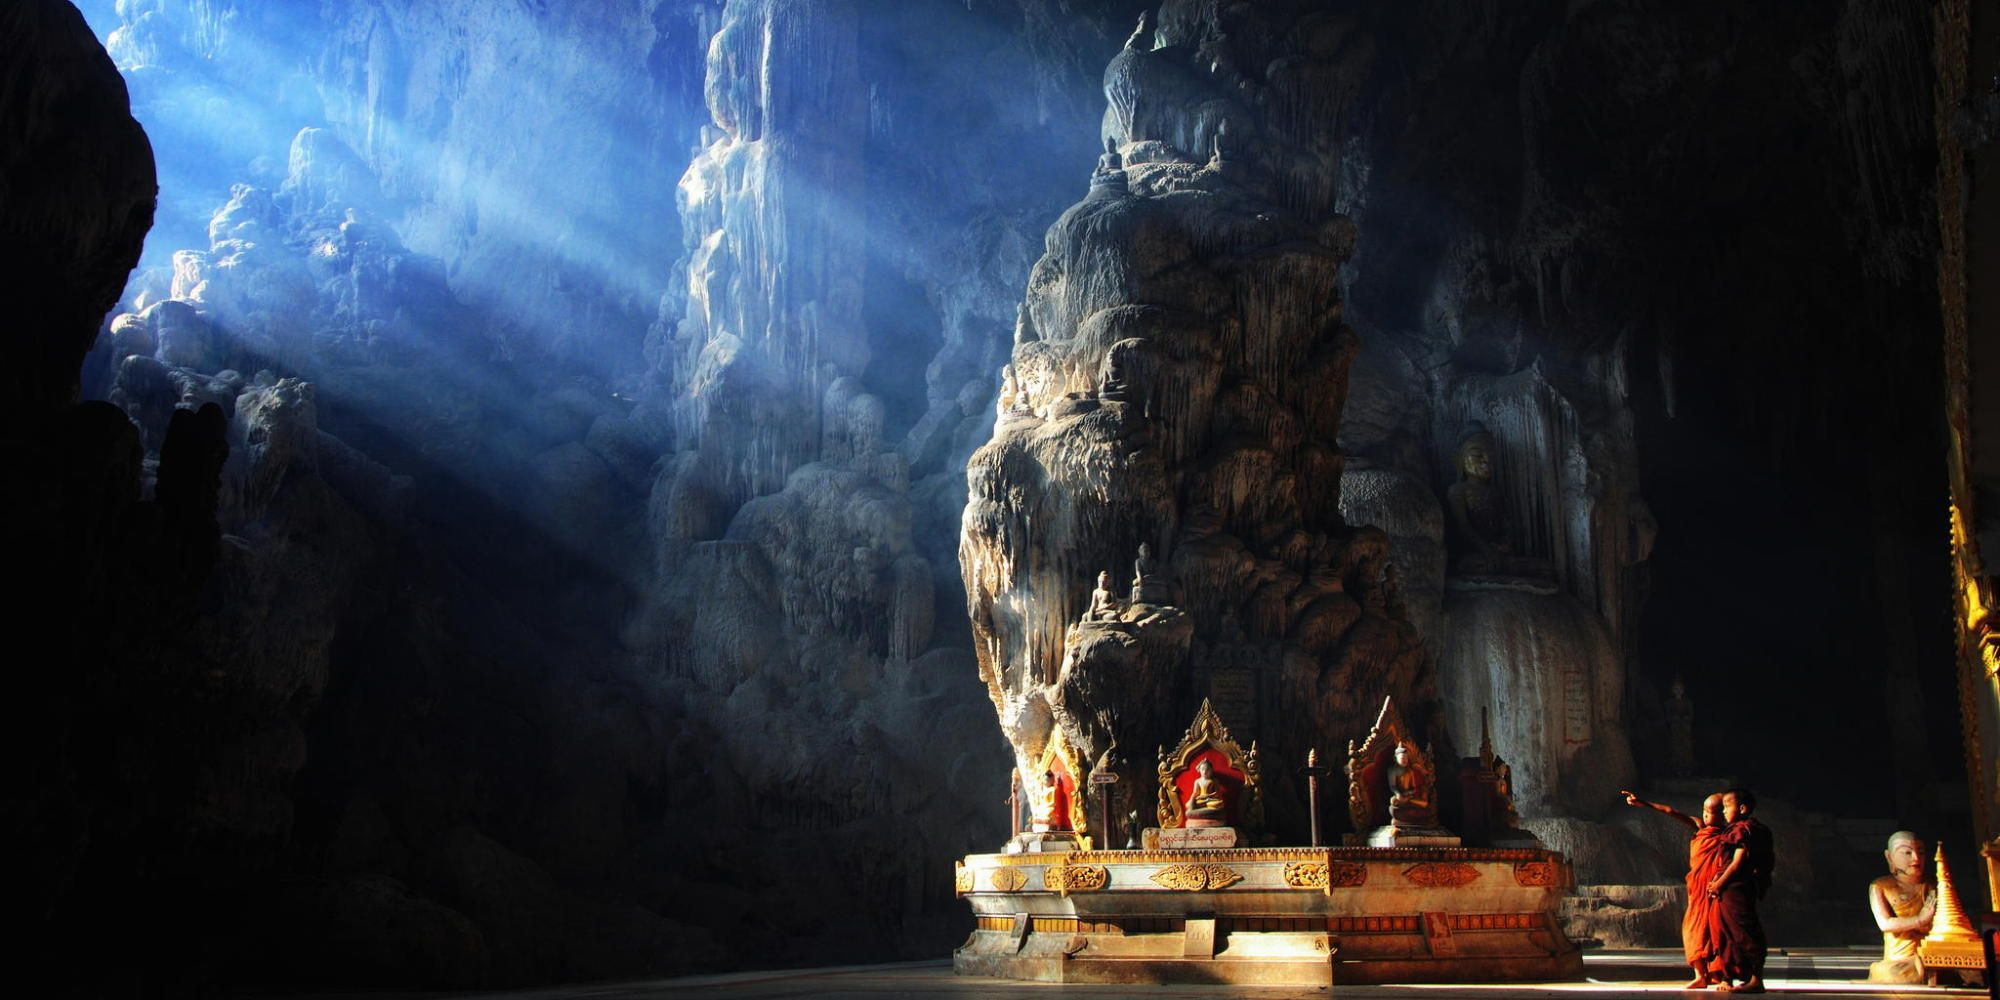 PHOTOS: Buddhist Cave Temples